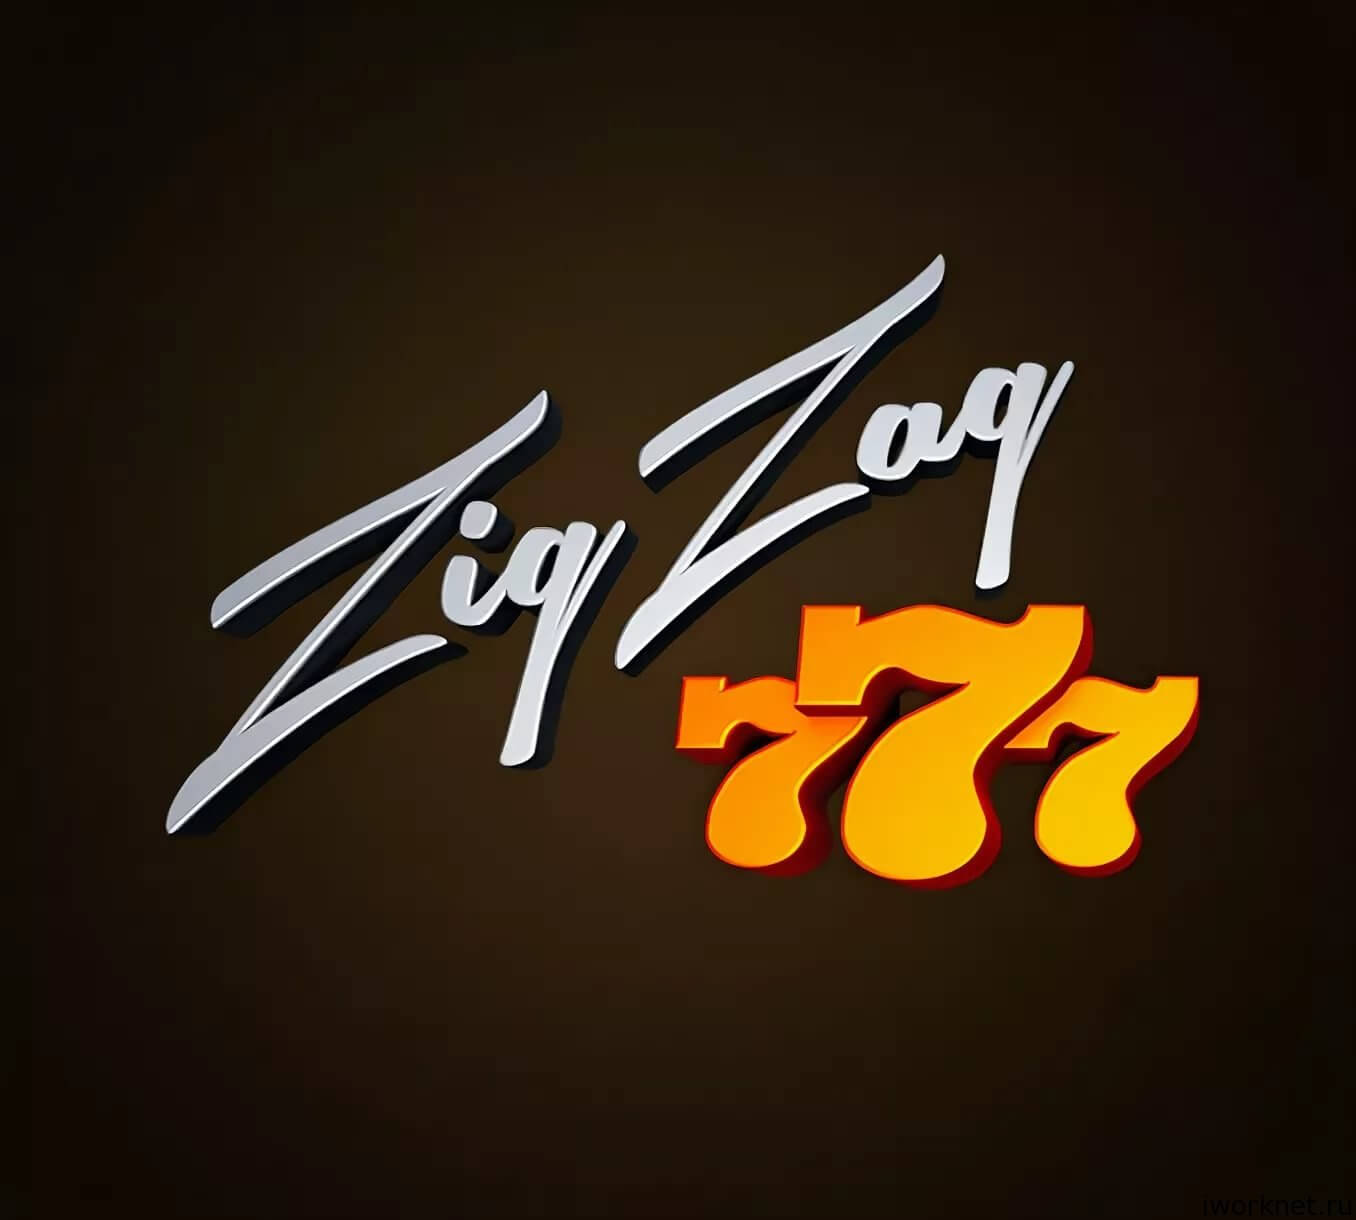 официальный сайт онлайн казино зигзаг 777 официальный сайт